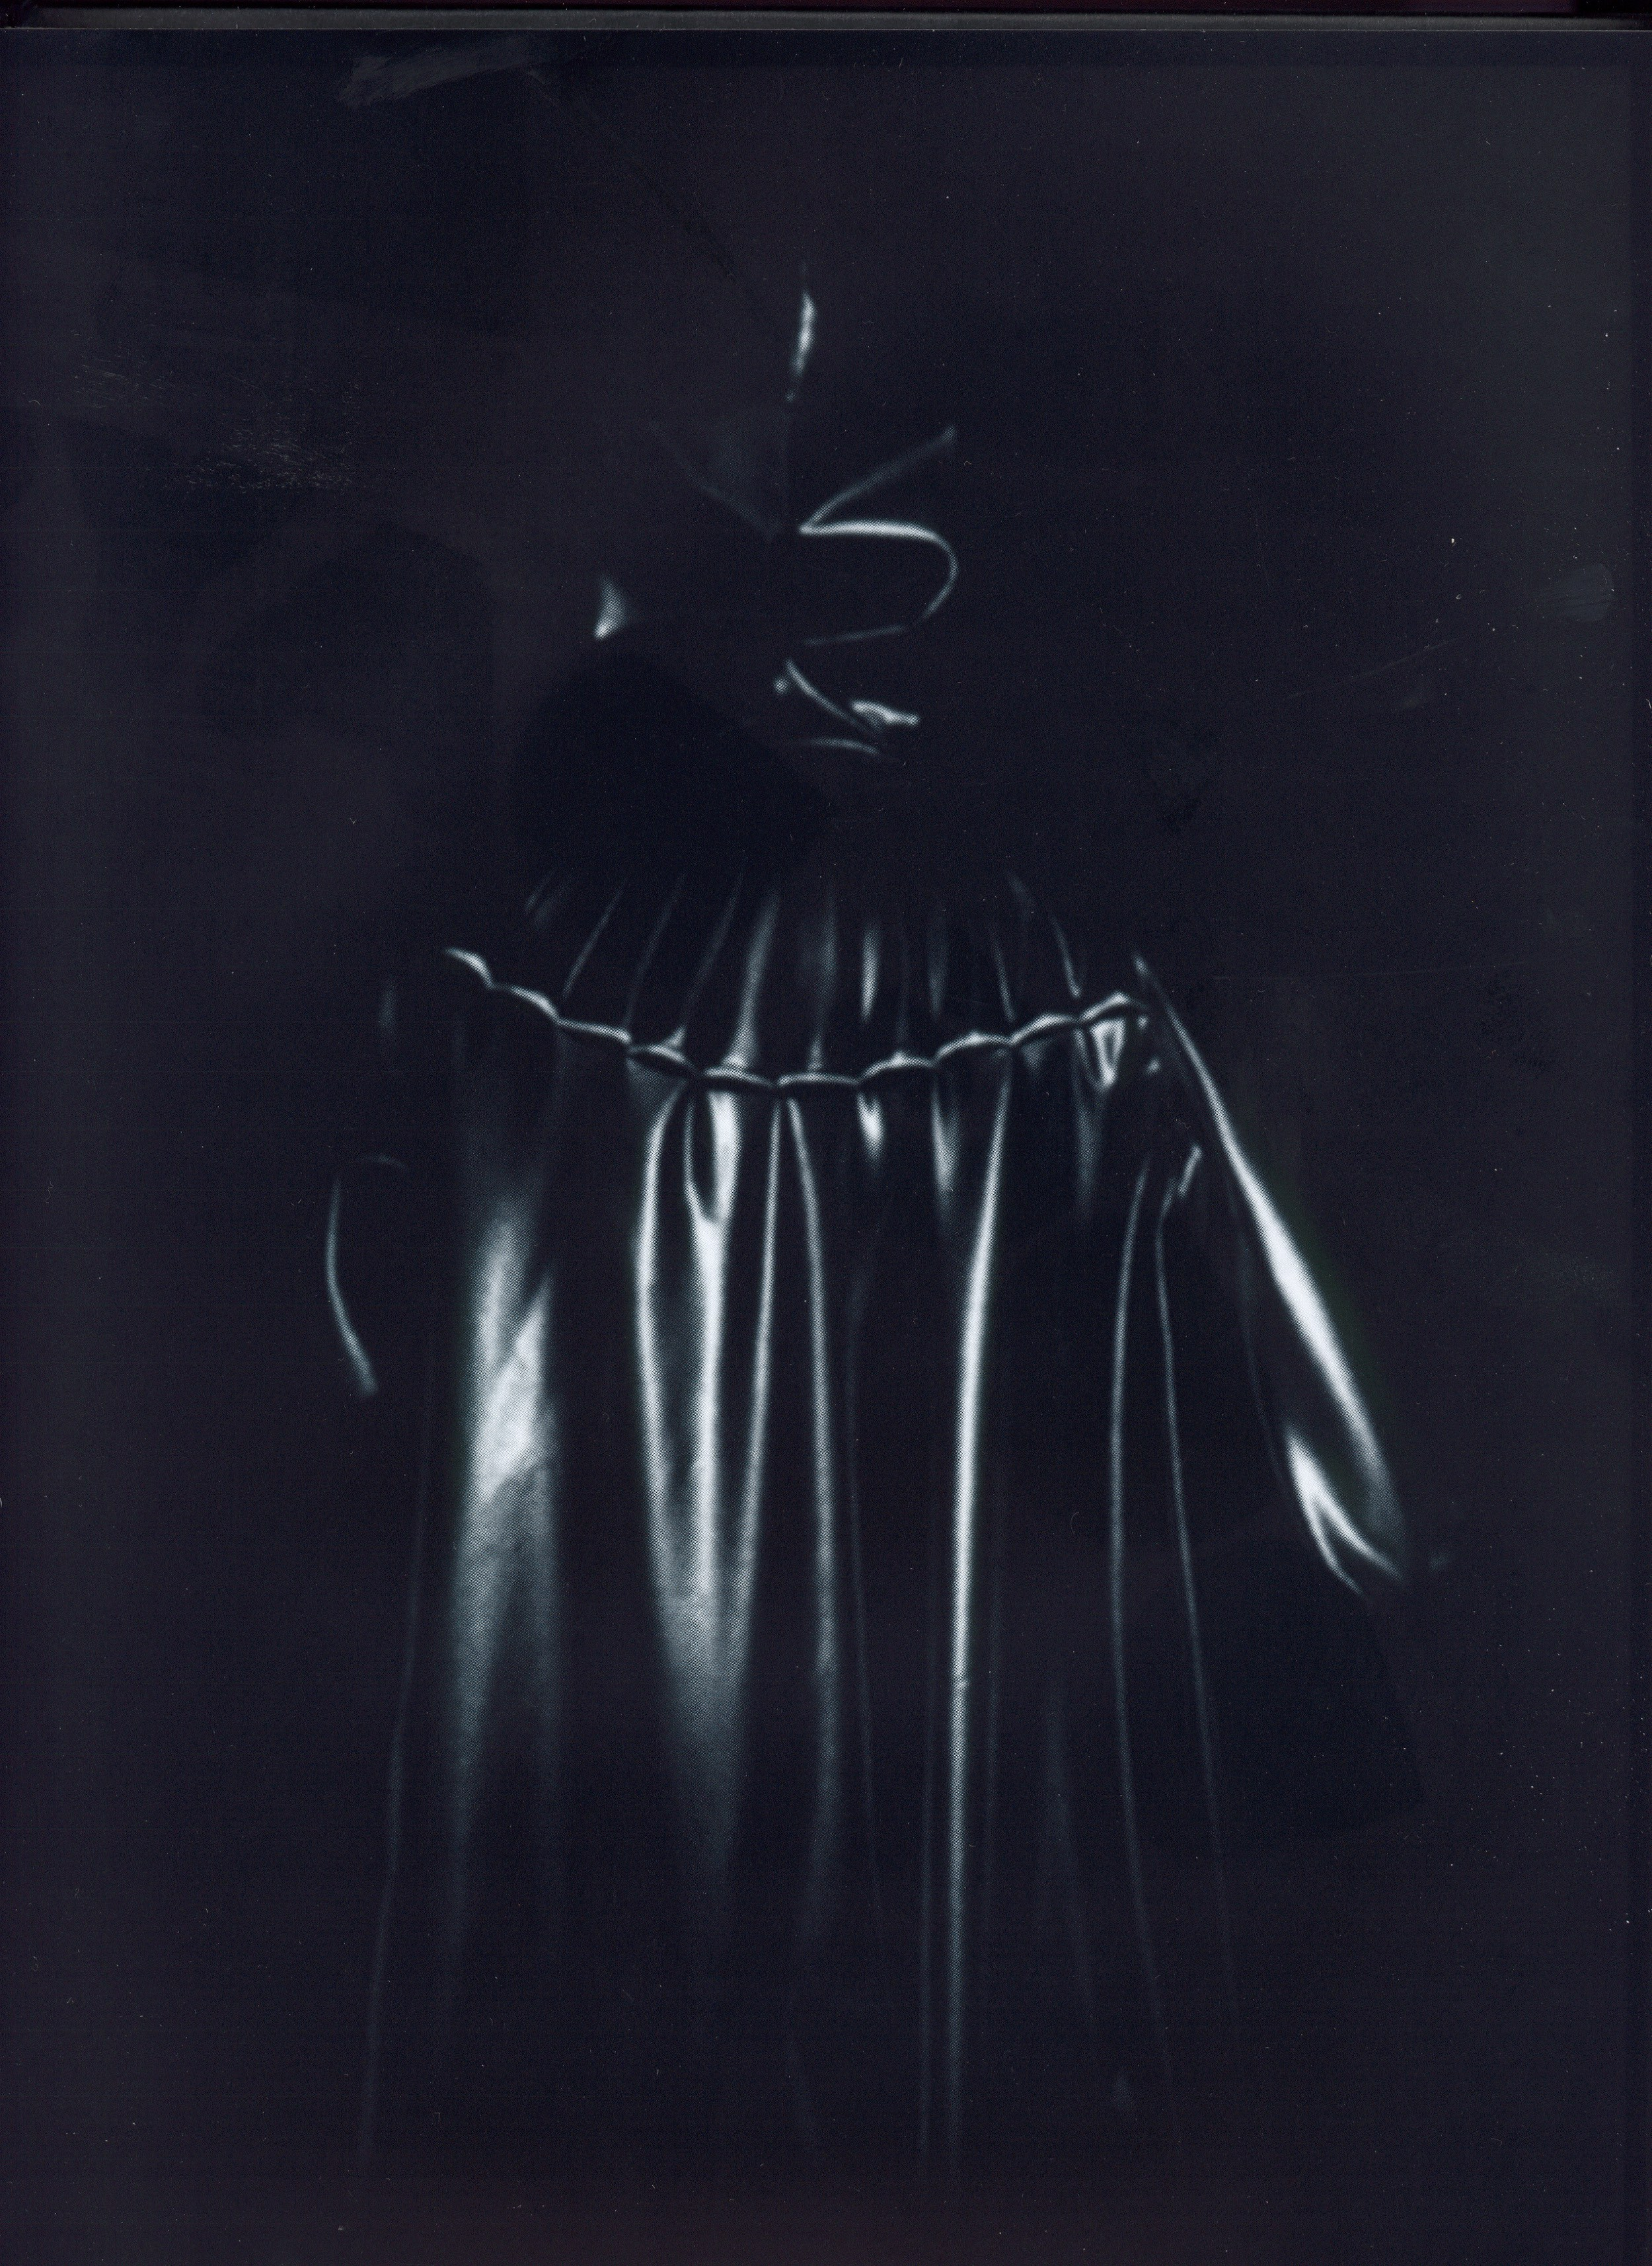 Rondinone_Ugo_Moonlighting_Editions_2000